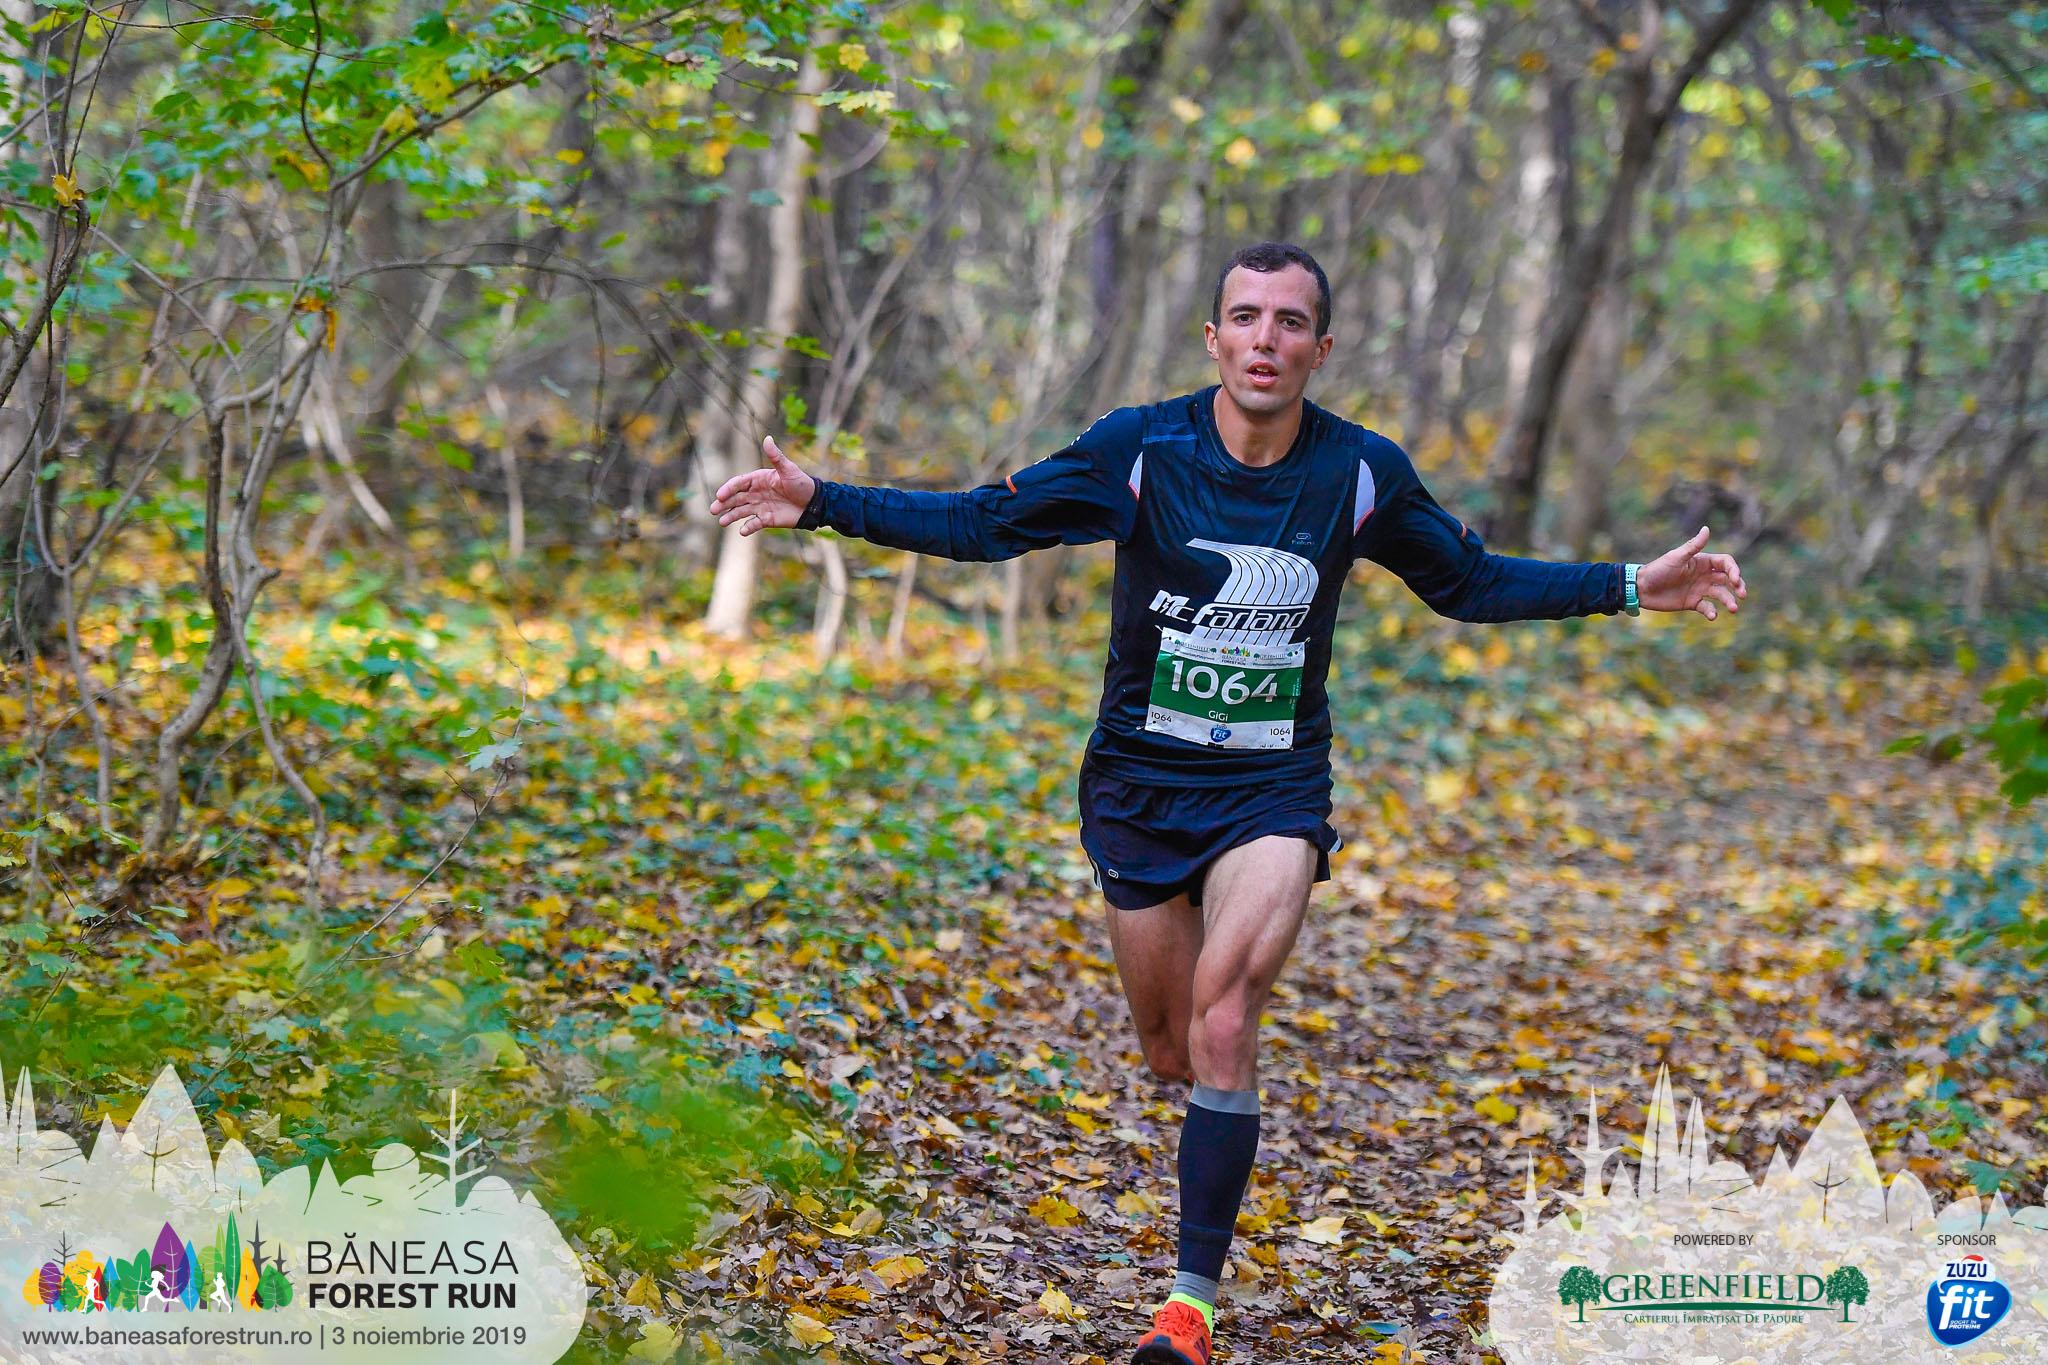 Gheorghe Nicolae - Baneasa Forest Run 2019 semimaraton